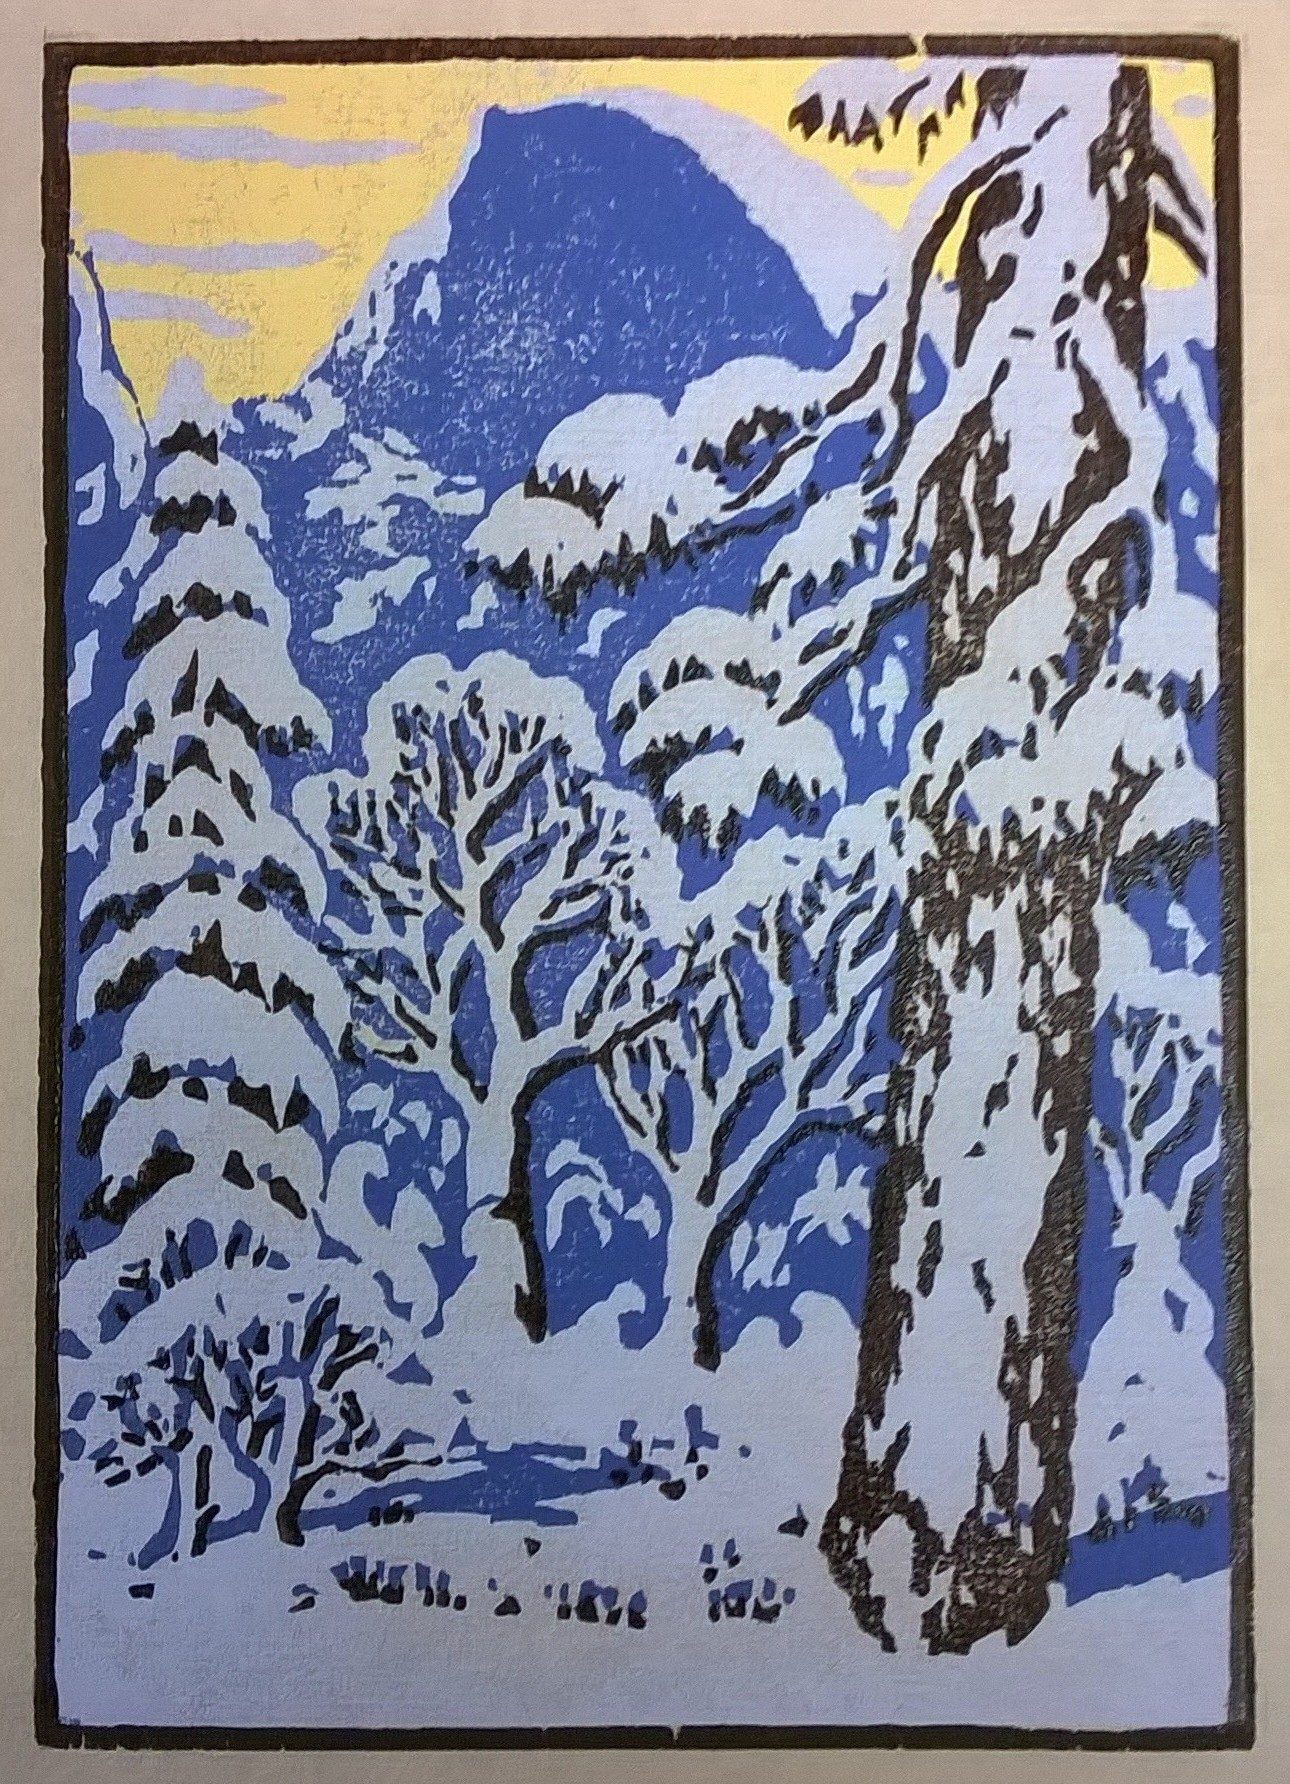 Half Dome Winter, Yosemite | Della Taylor Hoss Woodcut | Printed by Martino Hoss | 5.25 x 7.5 in | $250